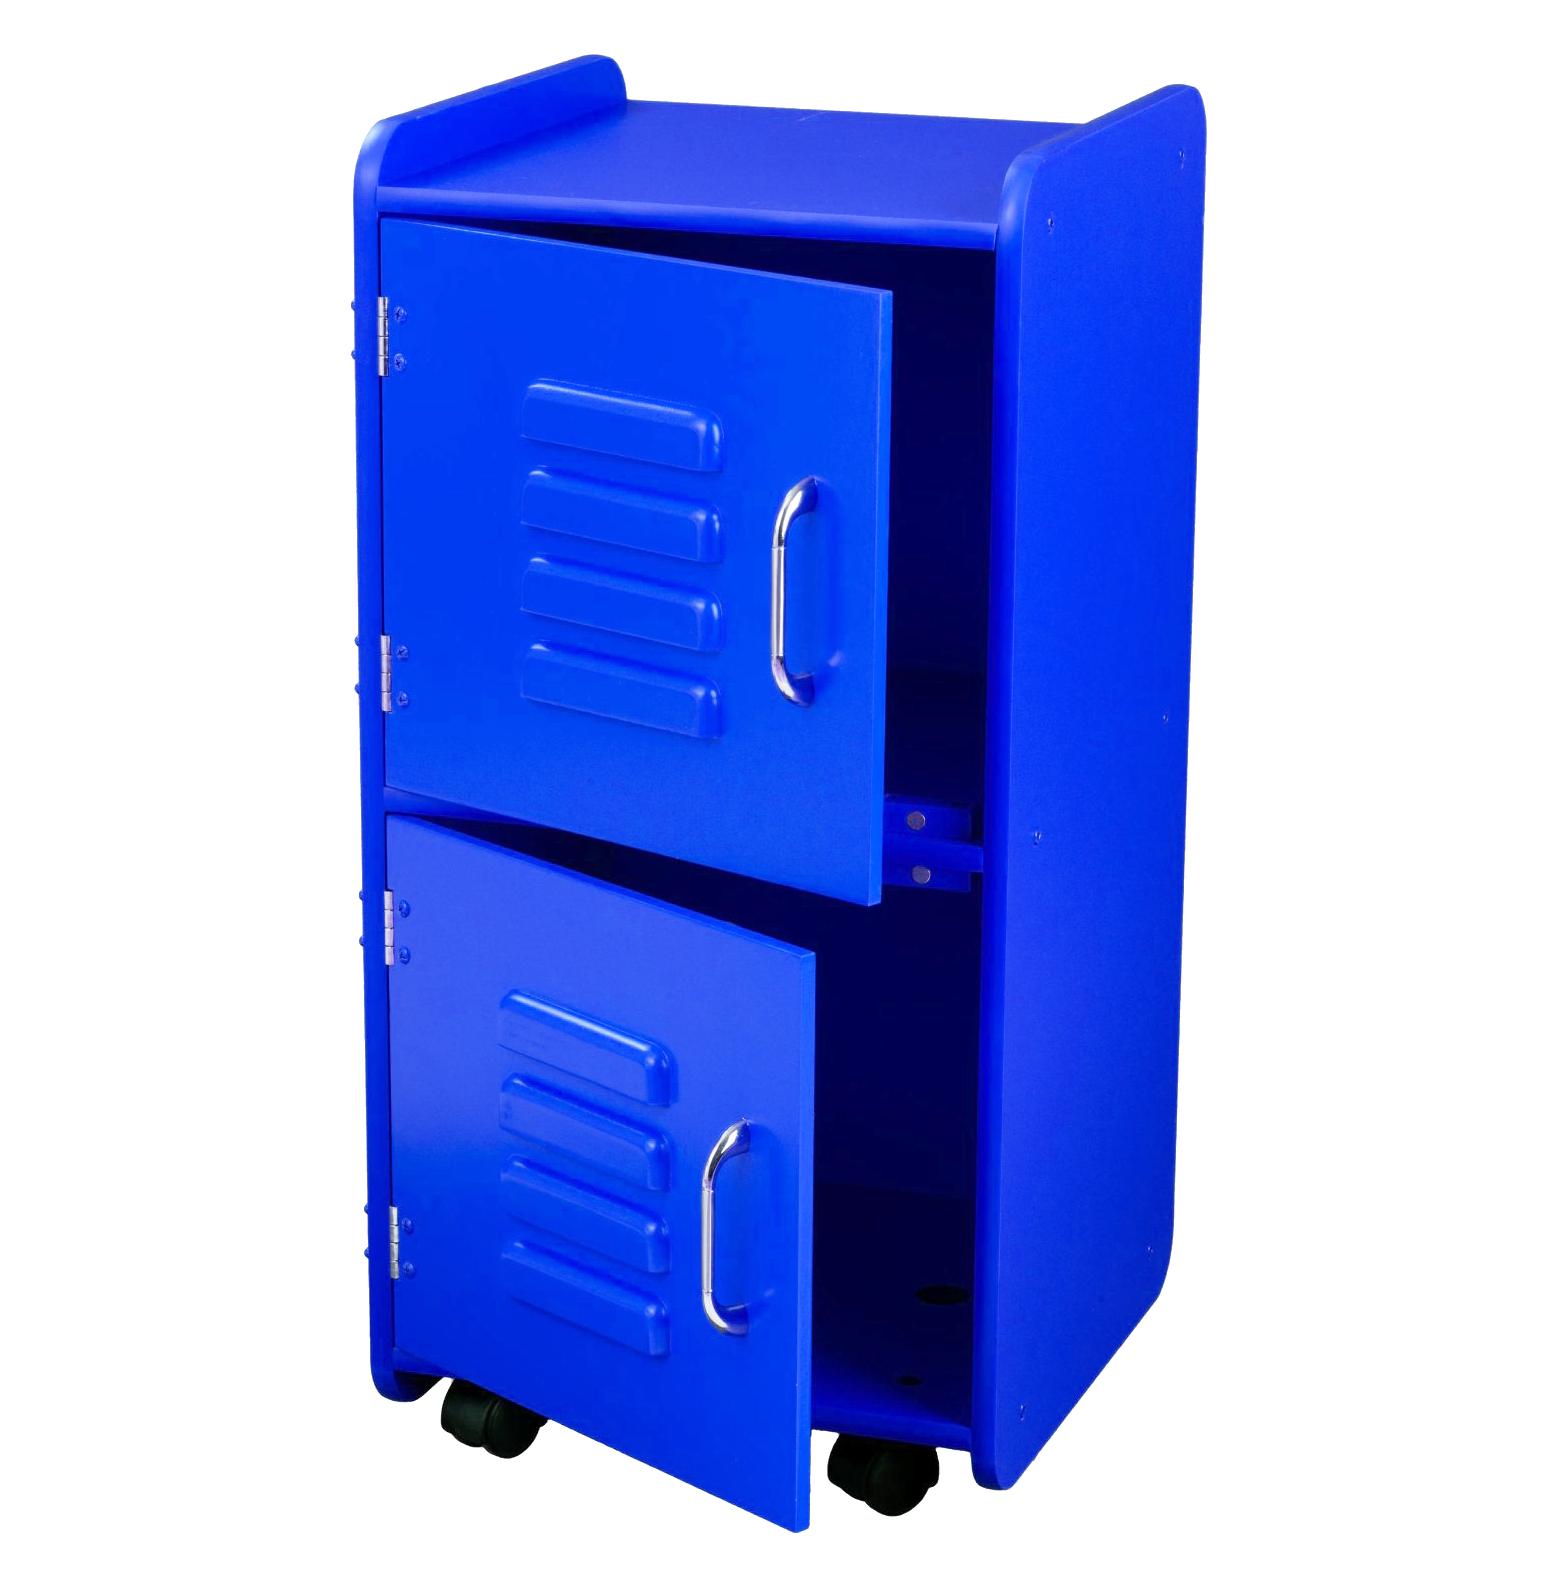 Png transparent image pngpix. Locker clipart student locker